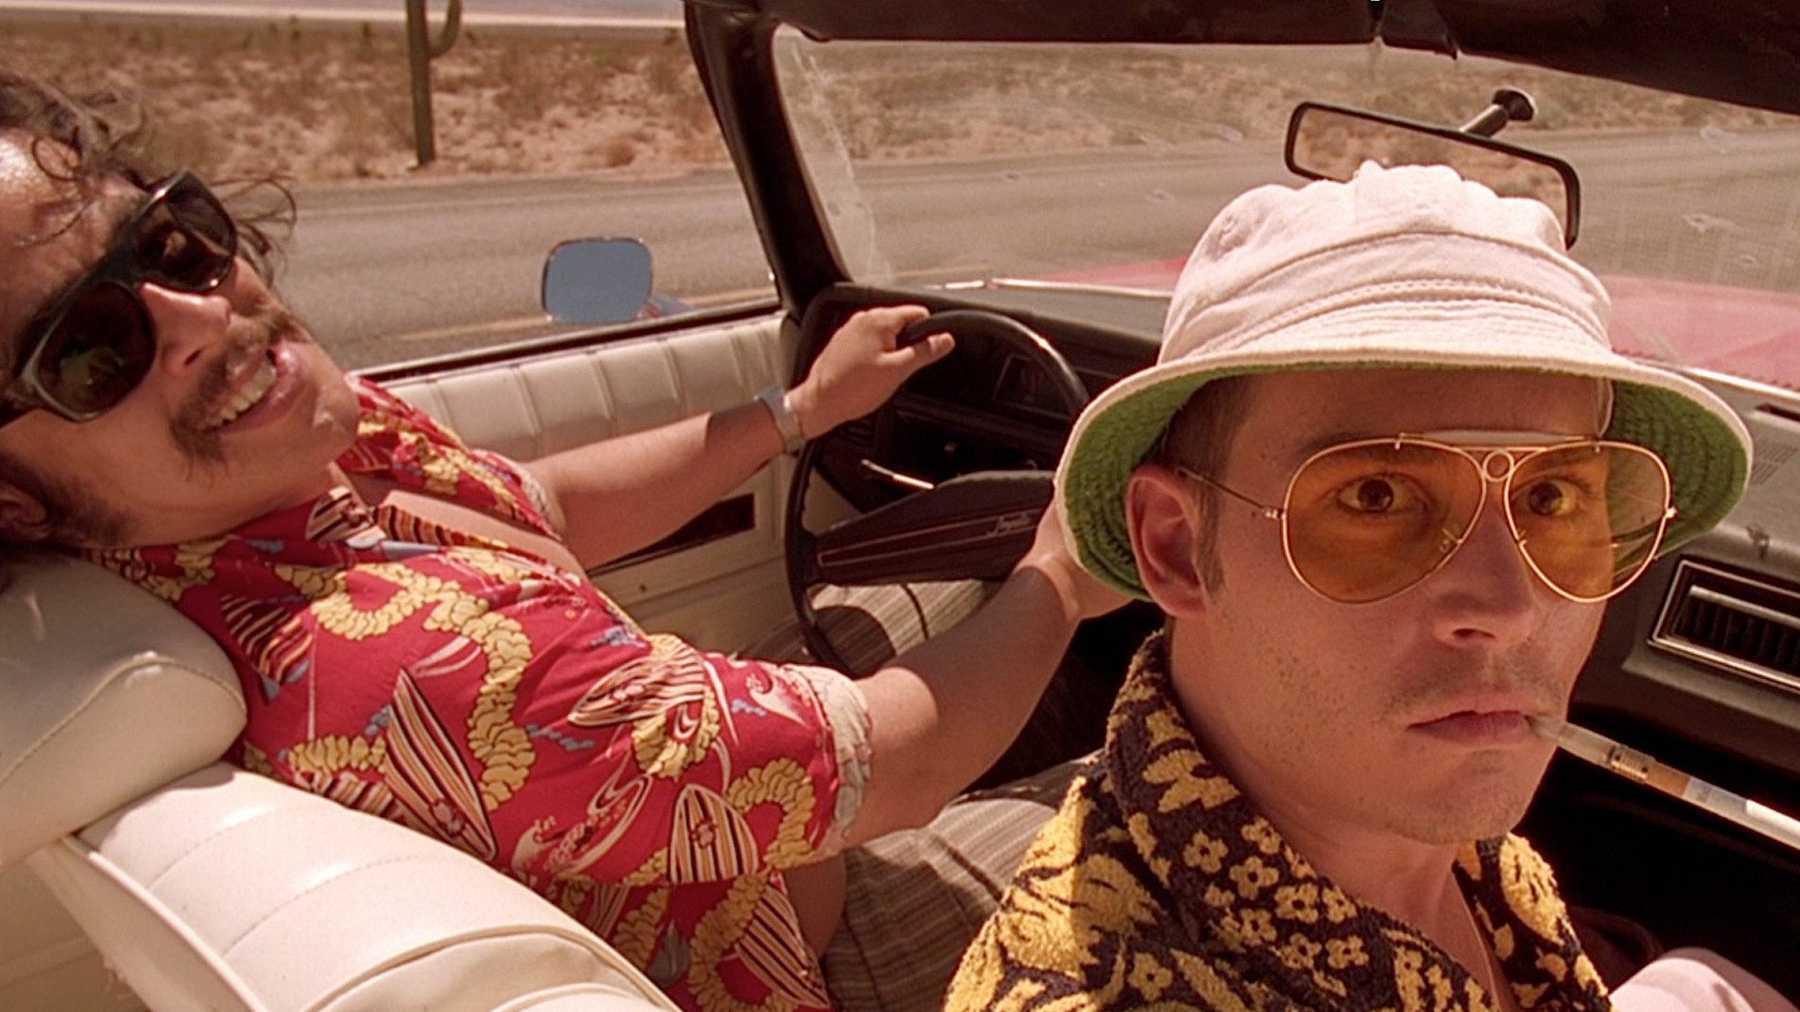 áo hawaii jonny depp trong phim fear and nothing